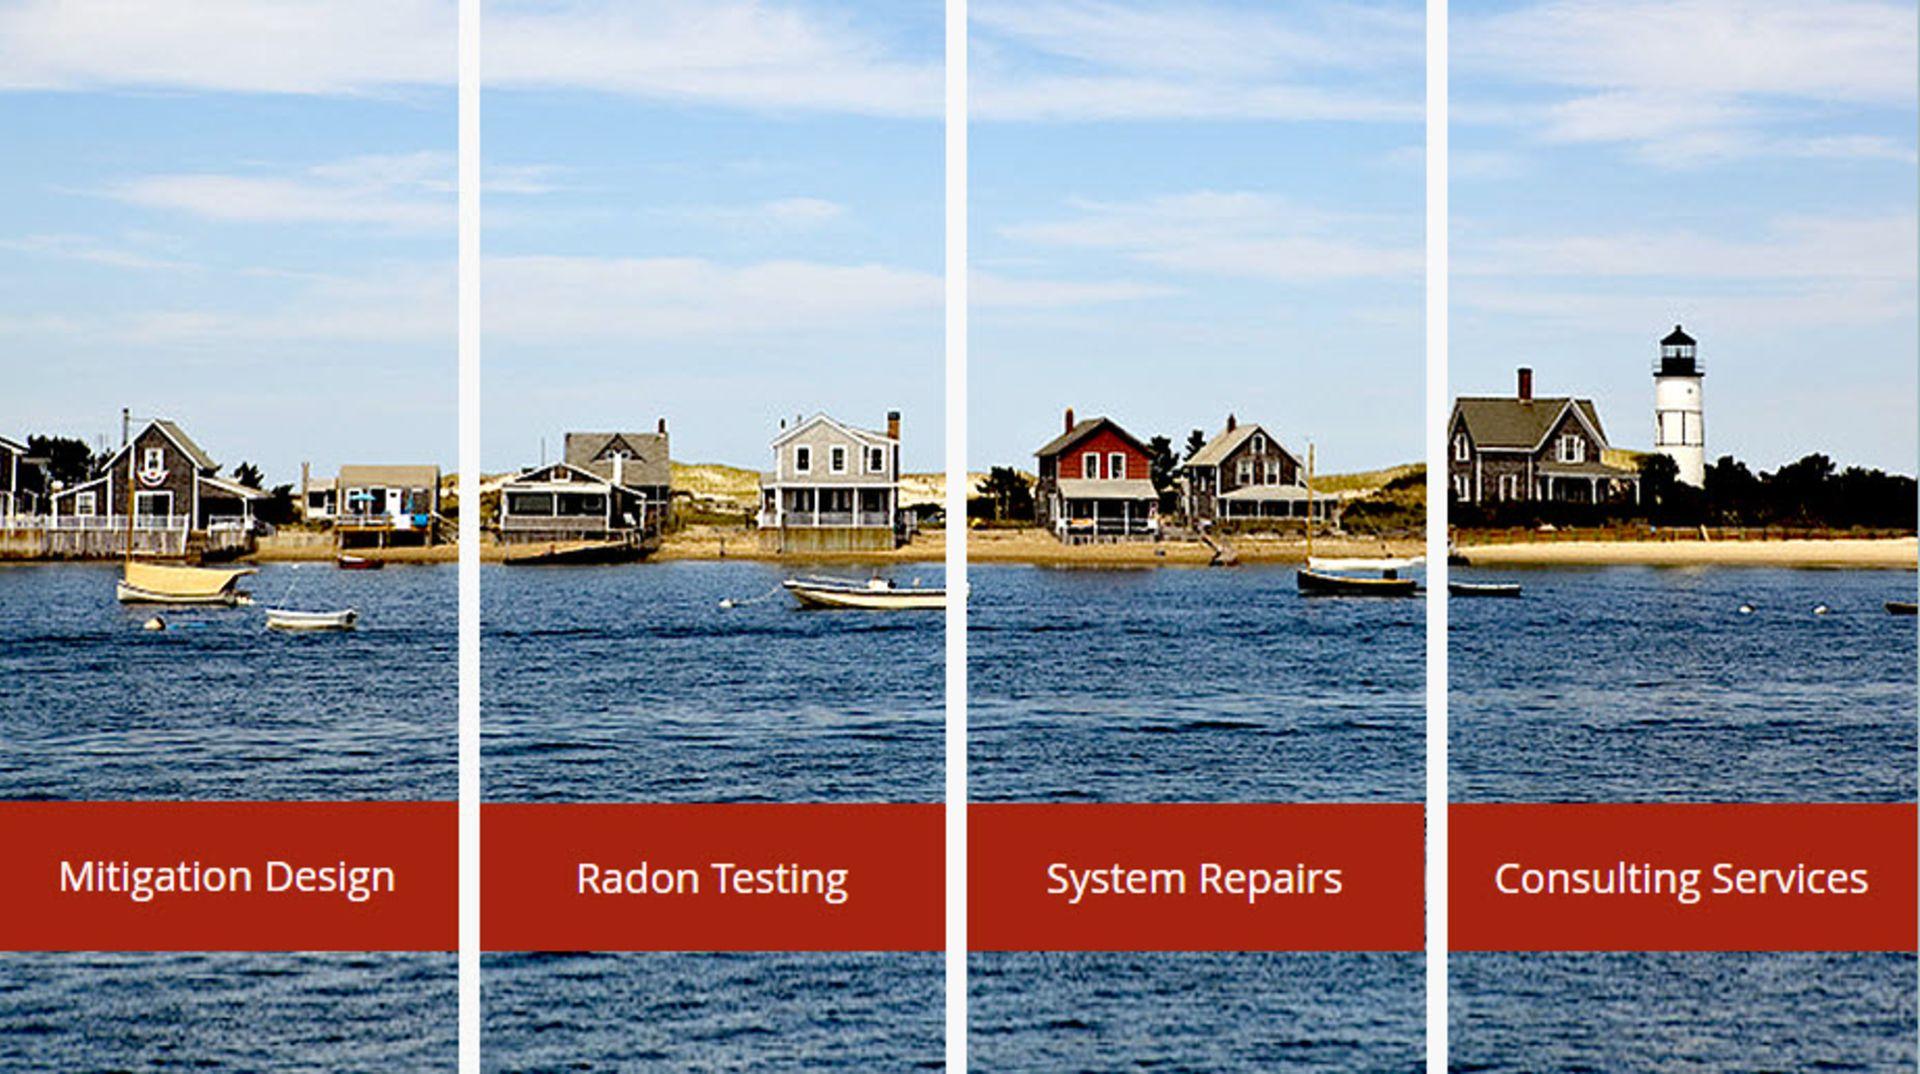 Radon testing & remediation